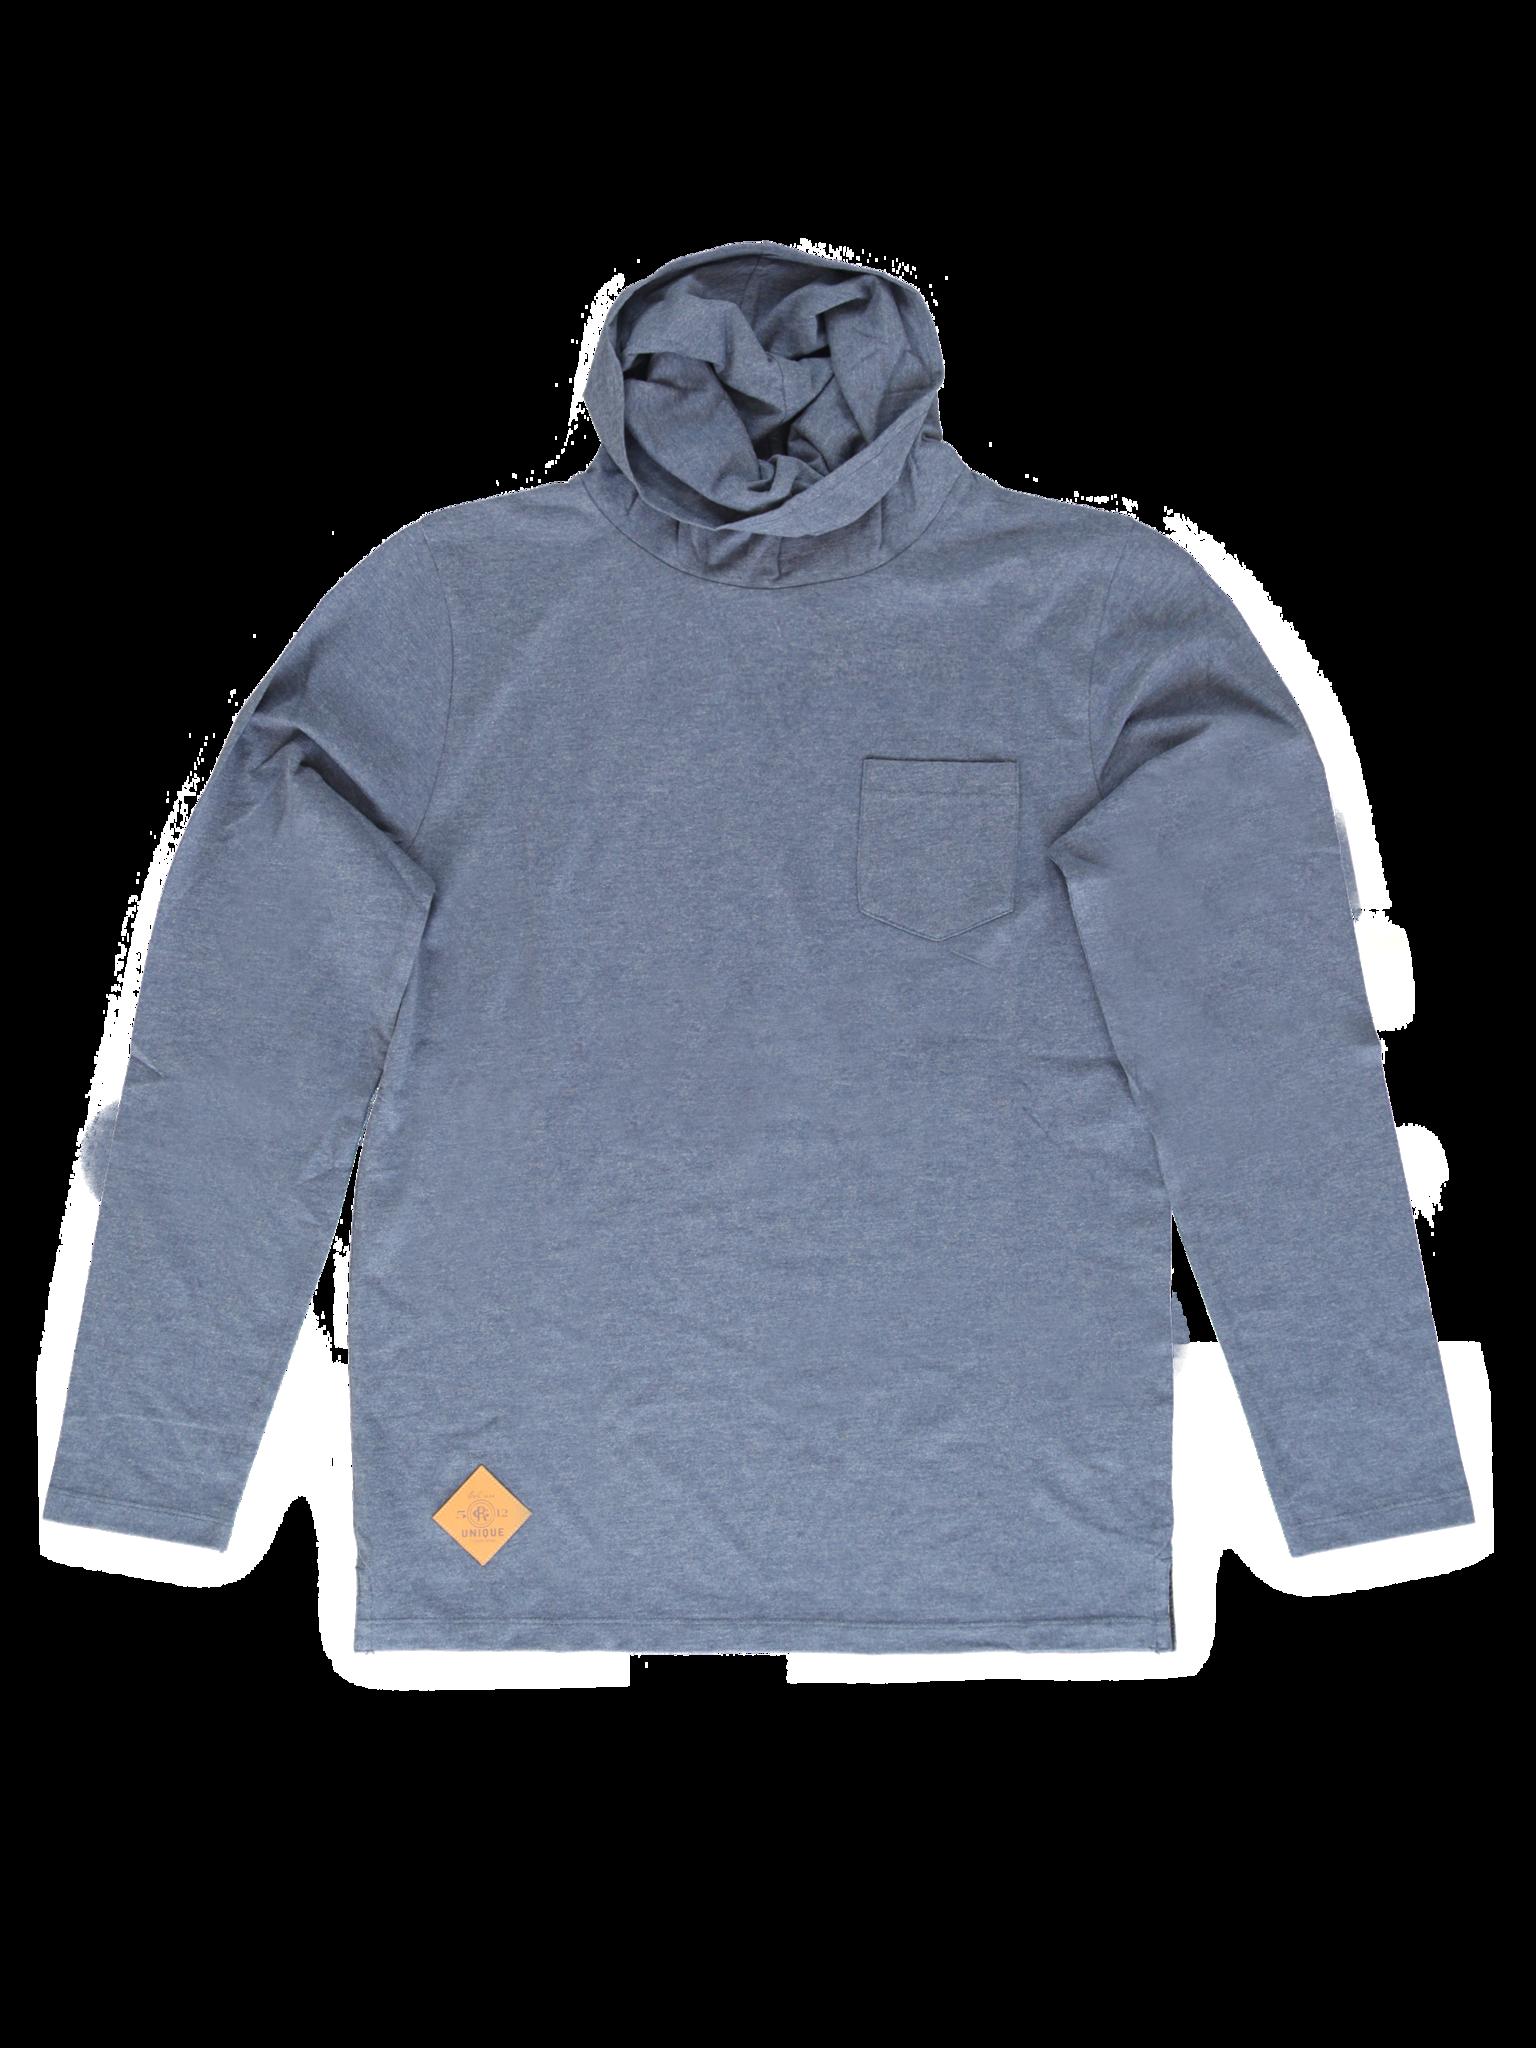 All Brands | Winterproducts Men | T-shirt | 18 pcs/box